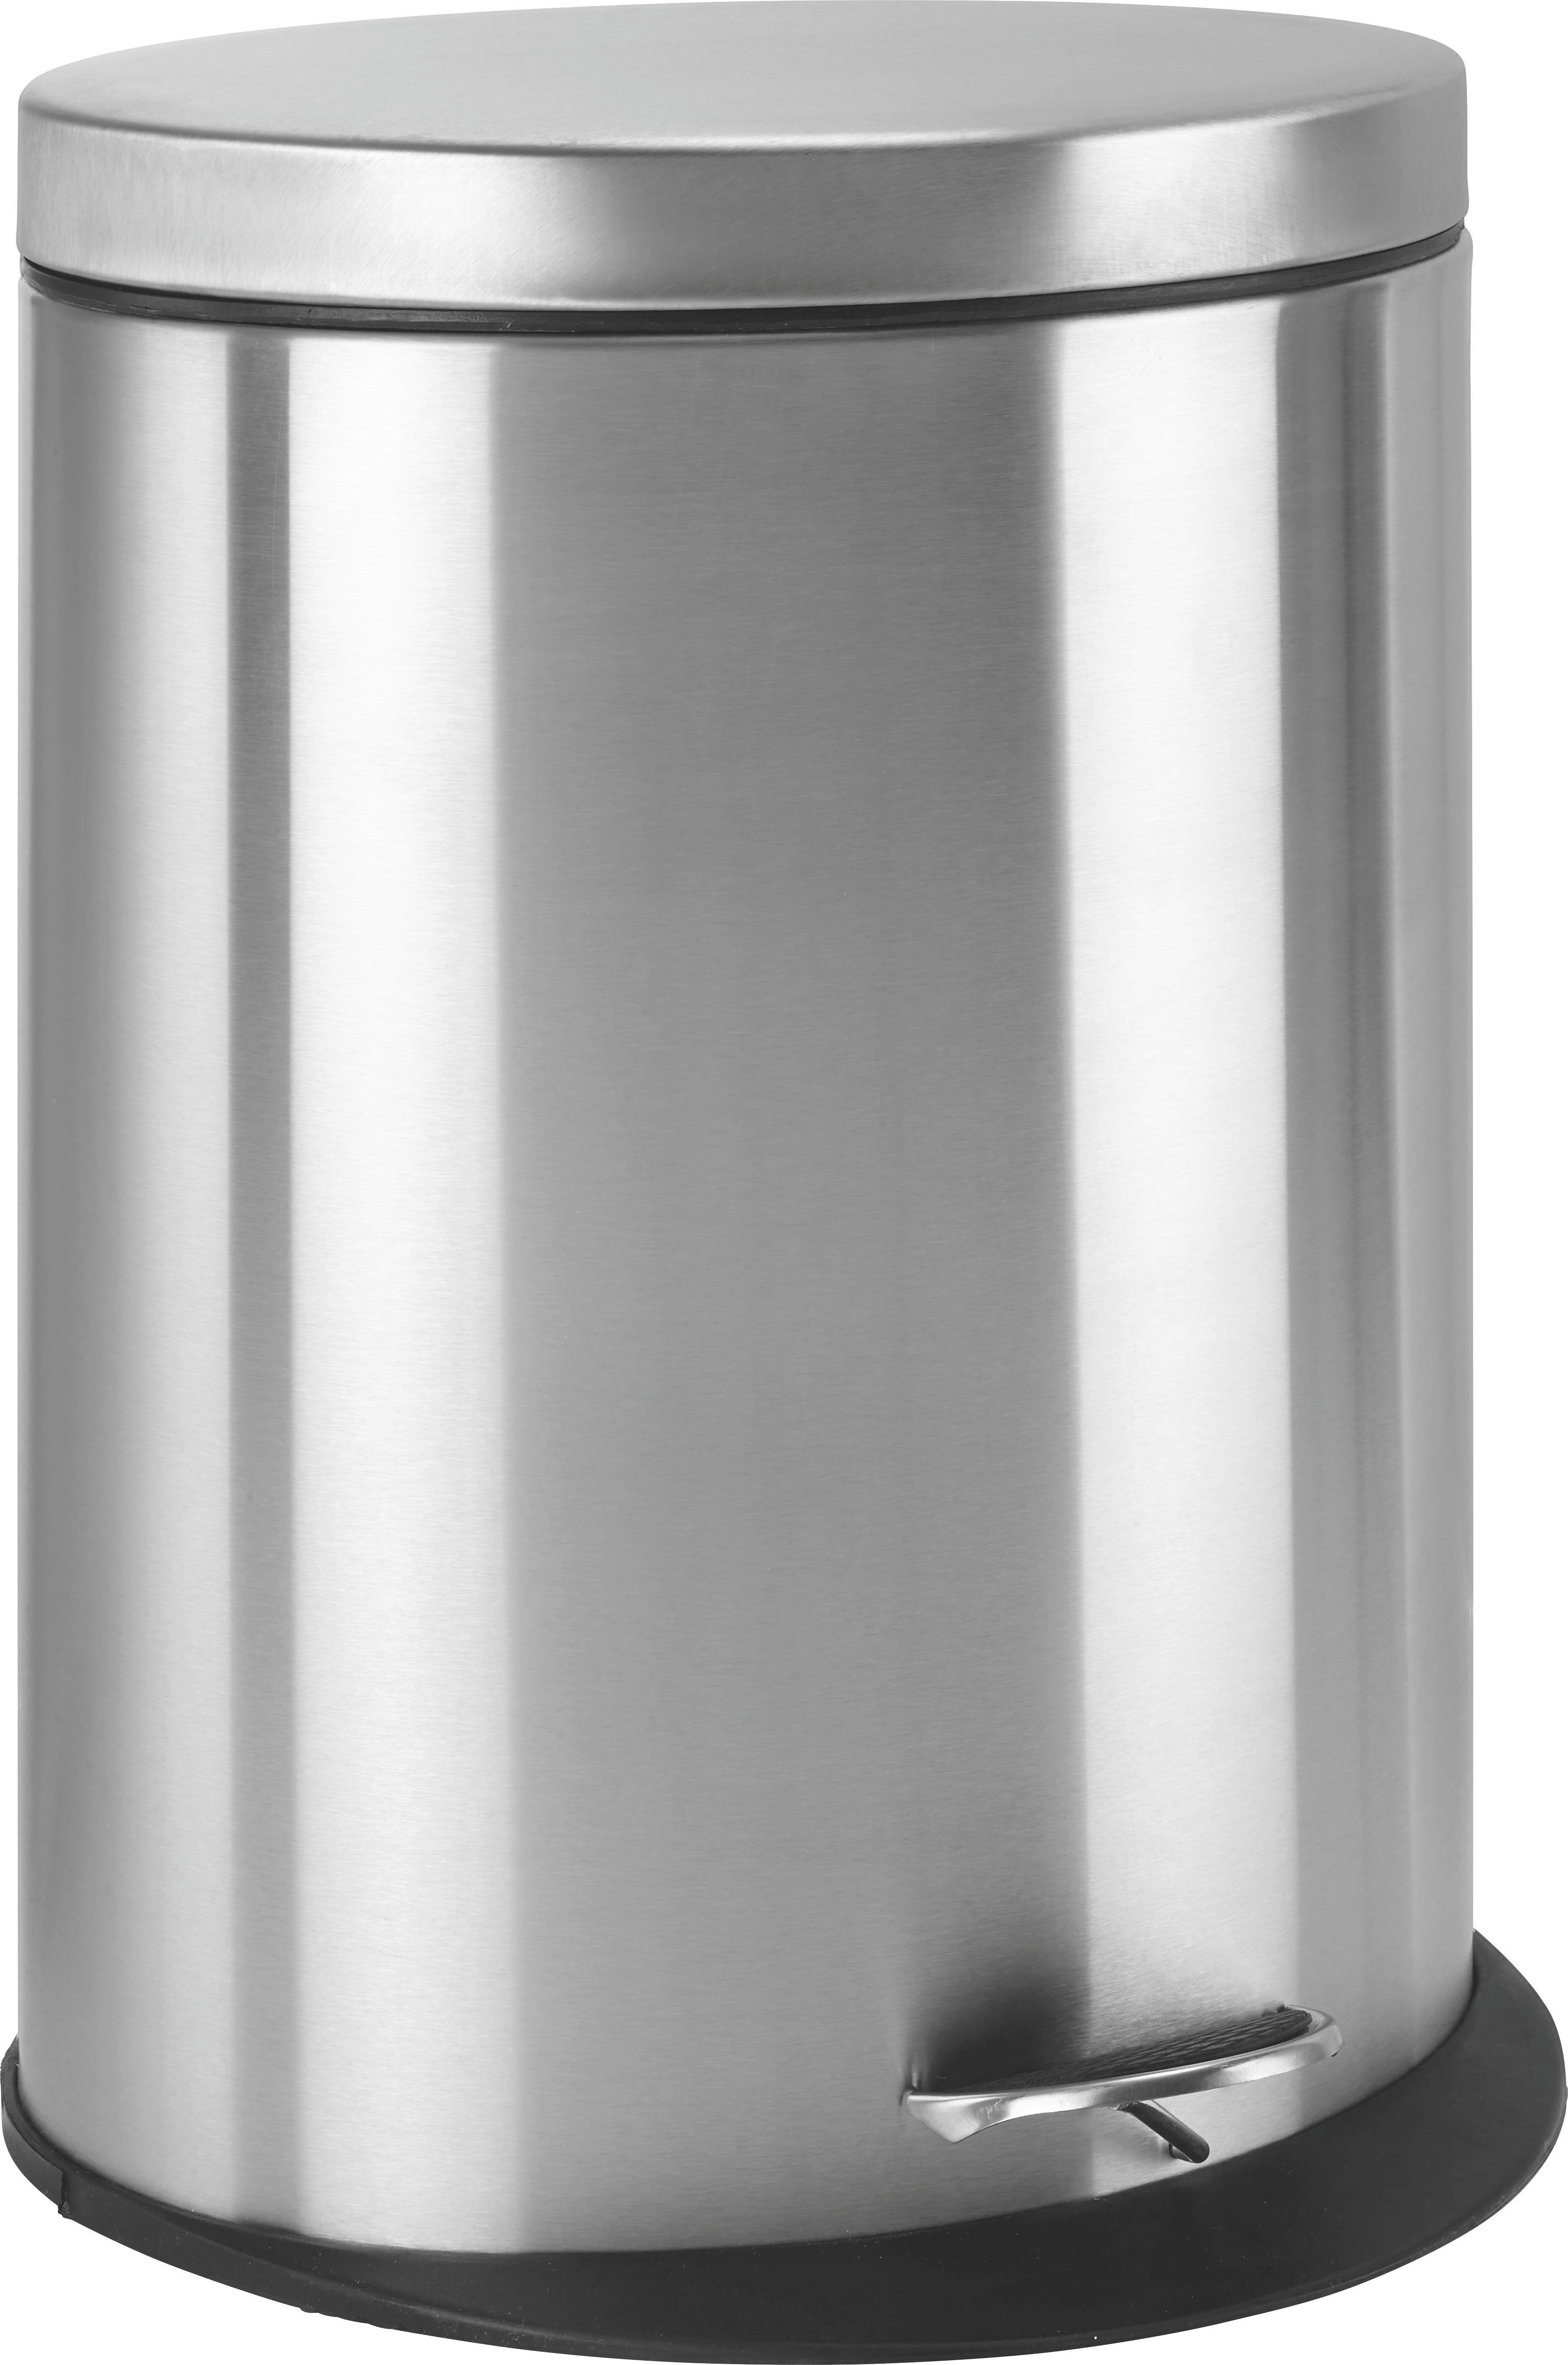 Treteimer Zoe in Chromfarben ca. 20l - Chromfarben/Schwarz, MODERN, Kunststoff/Metall (34/43,7/25cm) - MÖMAX modern living